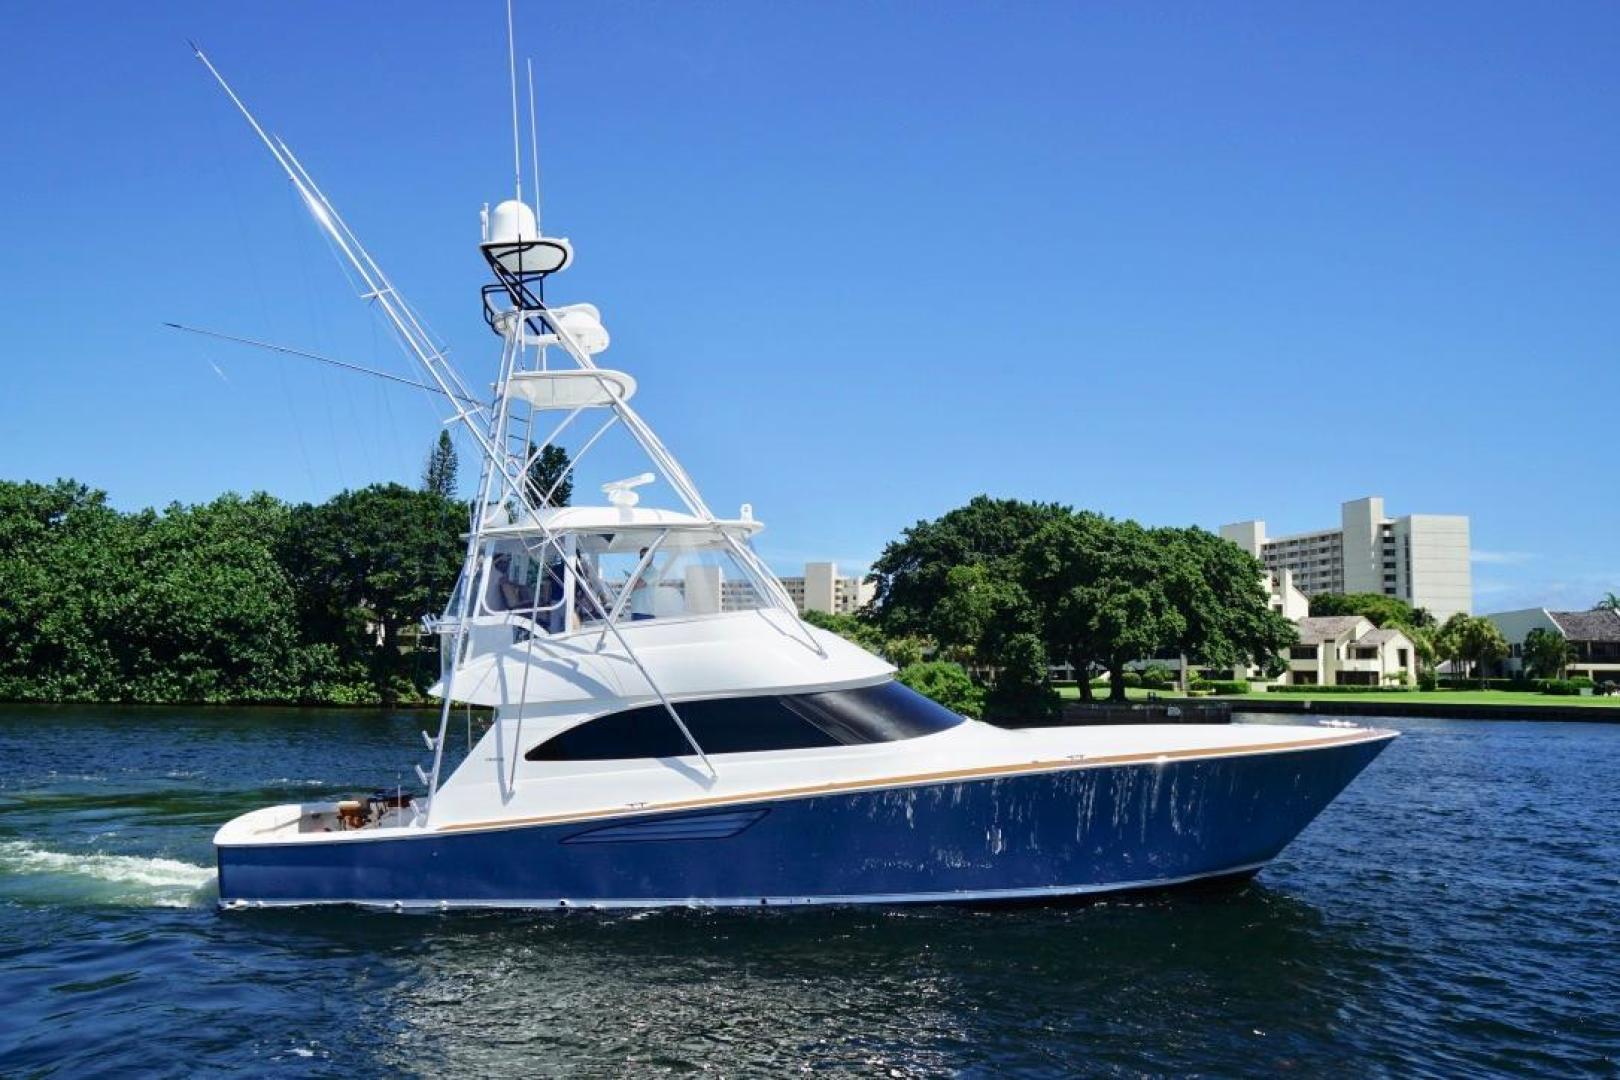 Viking-Convertible 2015-Lucky 24 Too Savannah-Georgia-United States-1538569 | Thumbnail